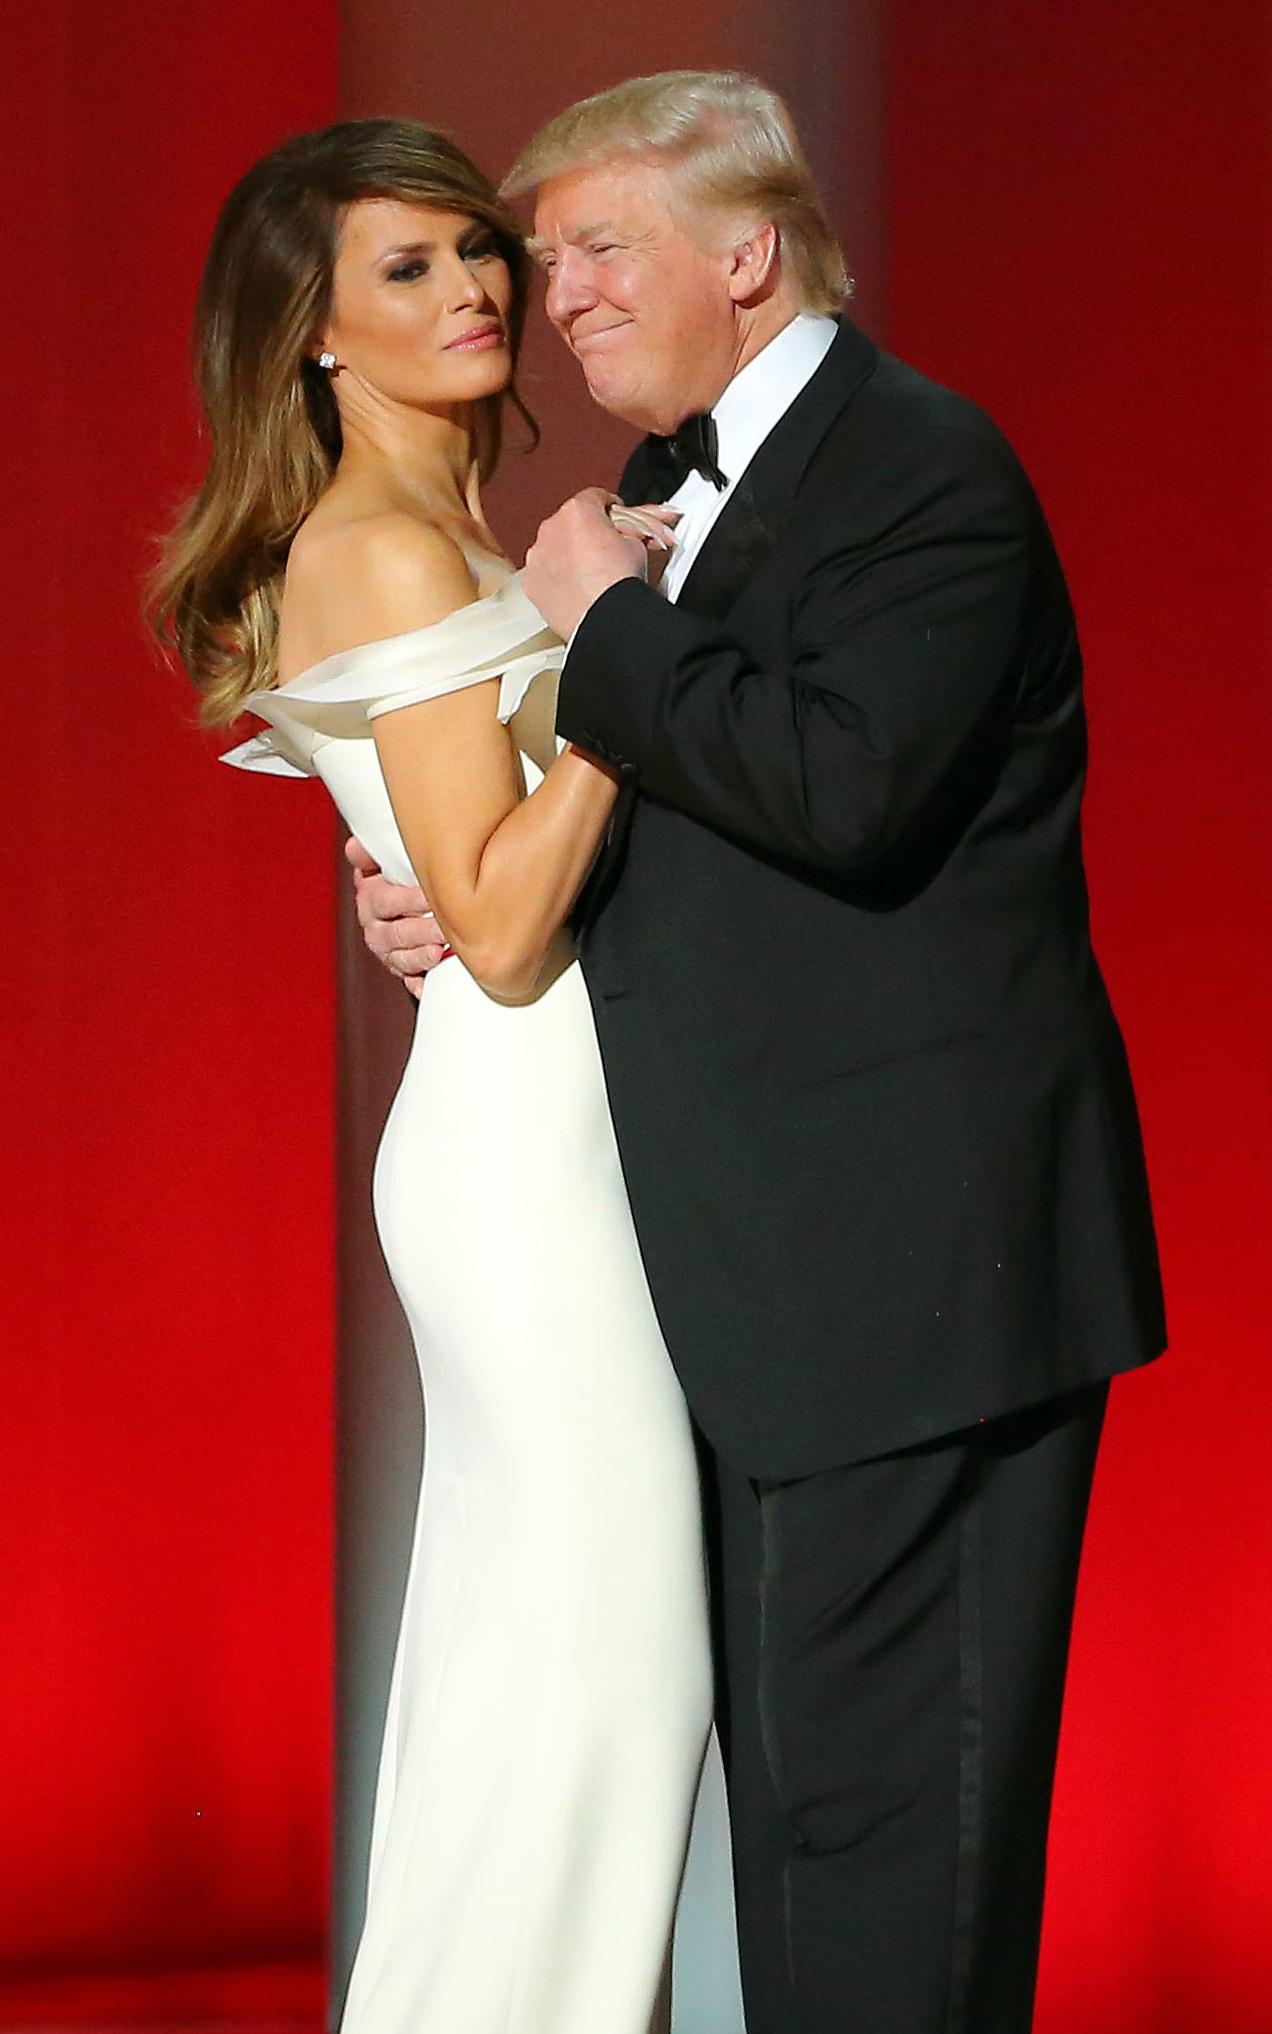 File Donald Melania Trump Dancing At Liberty Ball 01 20 17 Jpg Wikimedia Commons